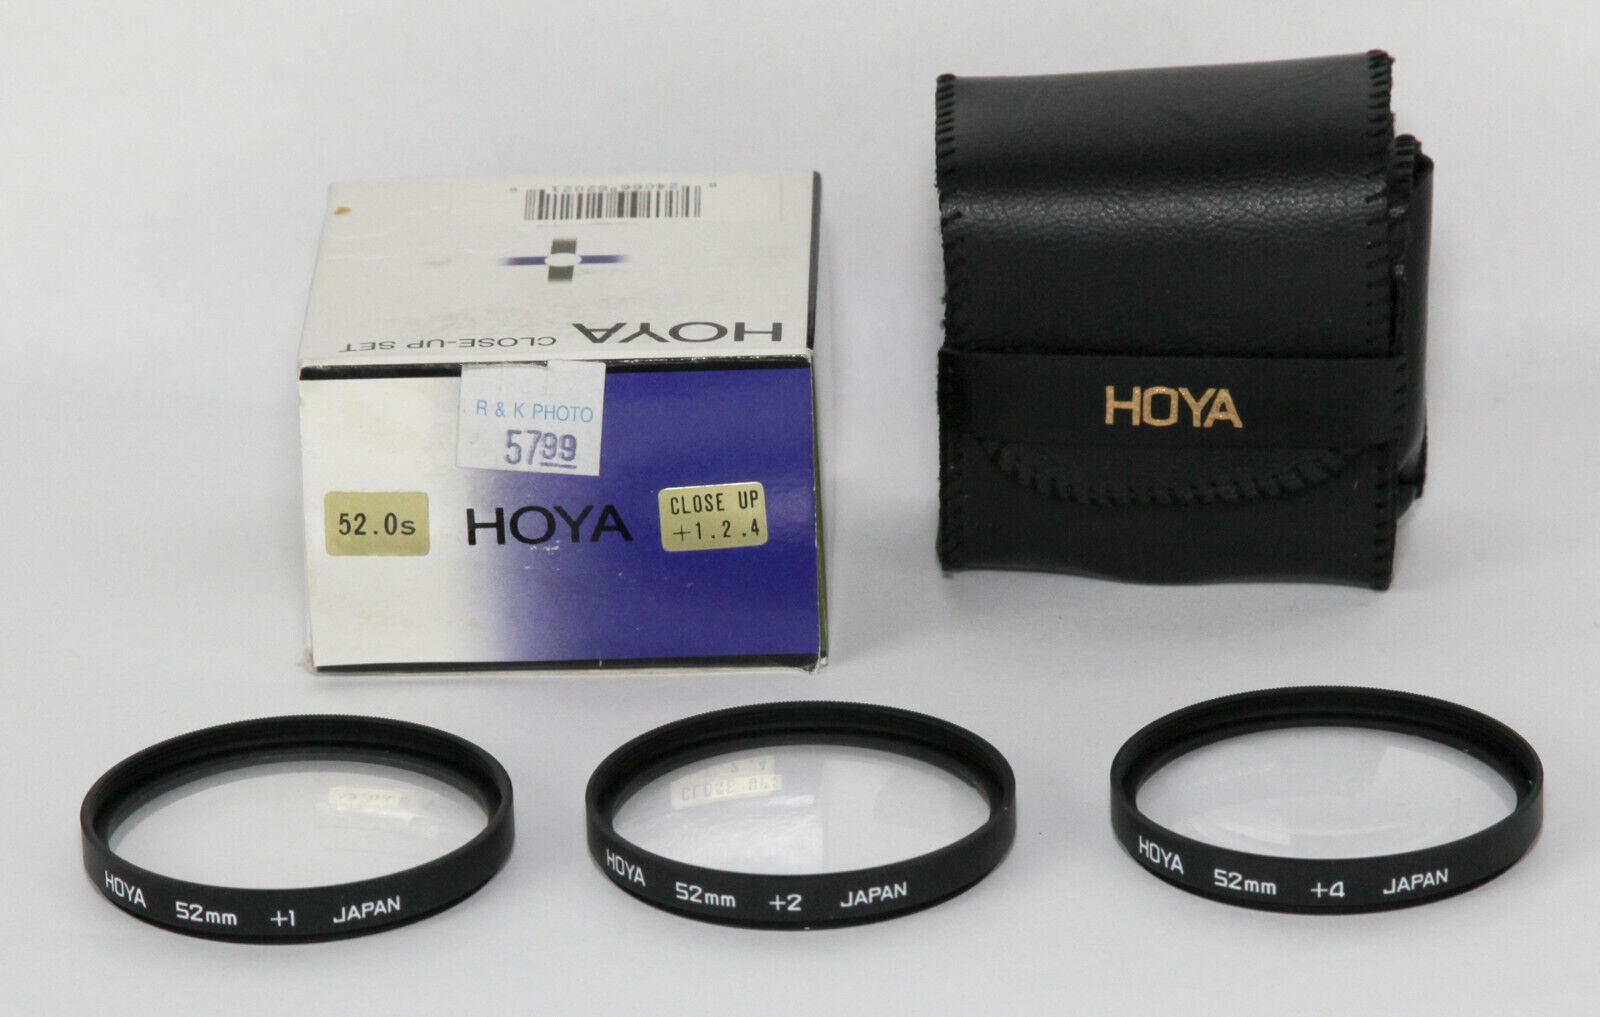 Hoya 52mm CLOSE-UP Lens Set 1 2 4 - $9.95